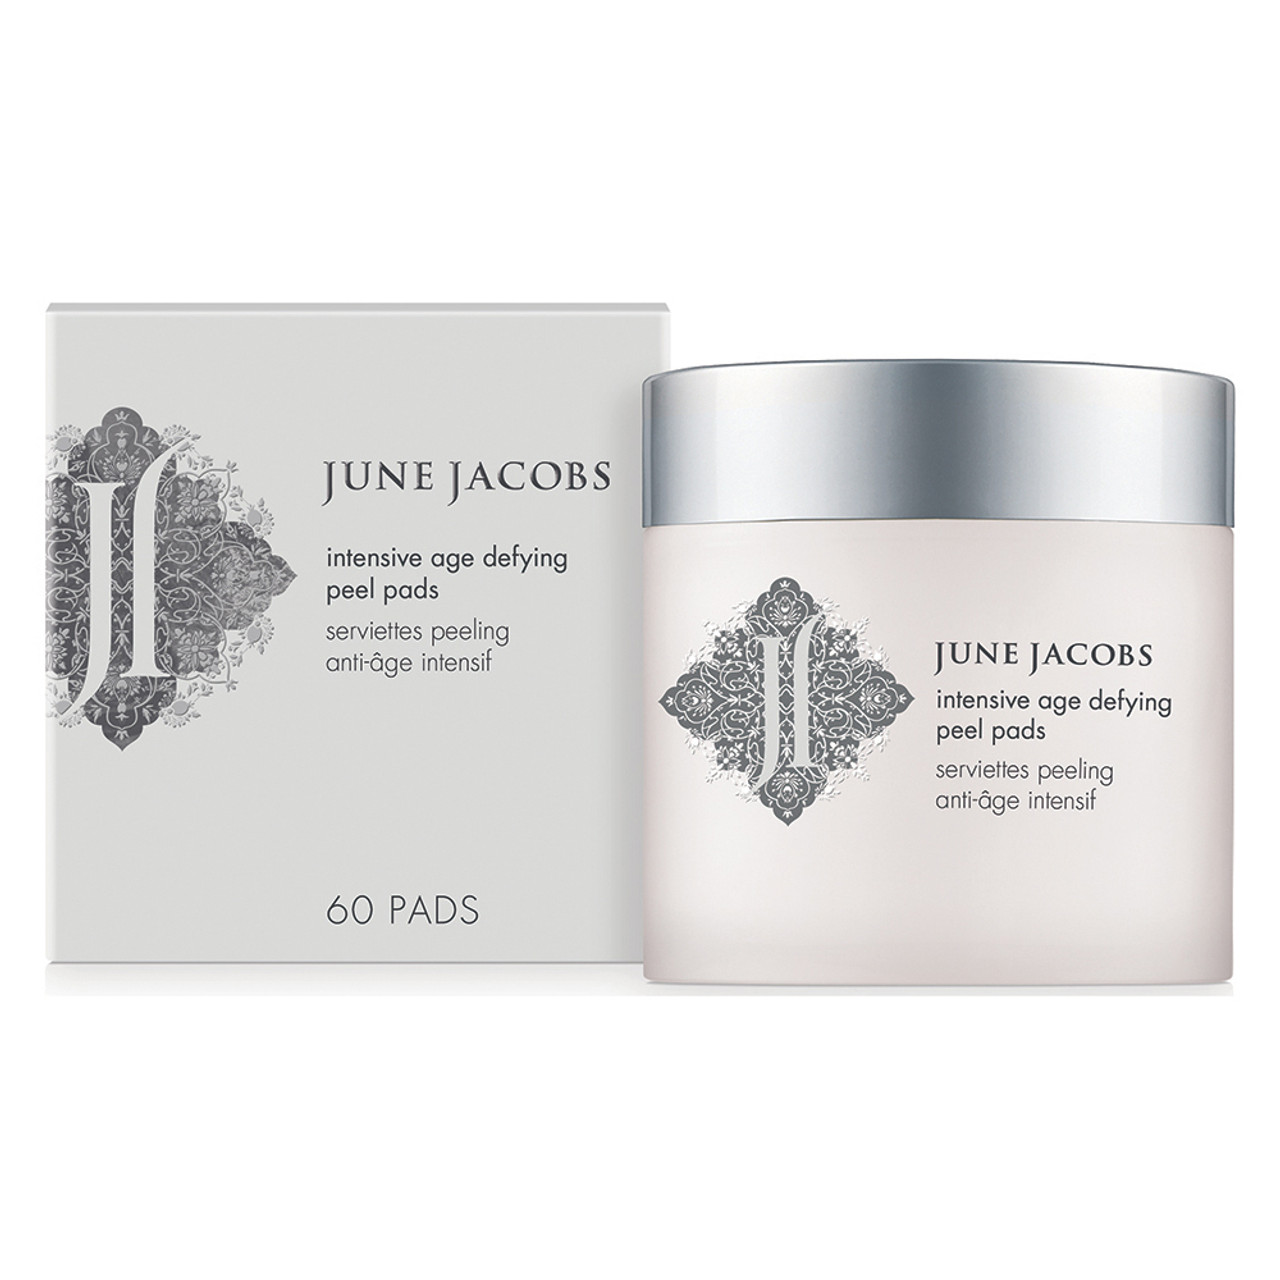 June Jacobs Intensive Age Defying Peel Pads, 60 pads